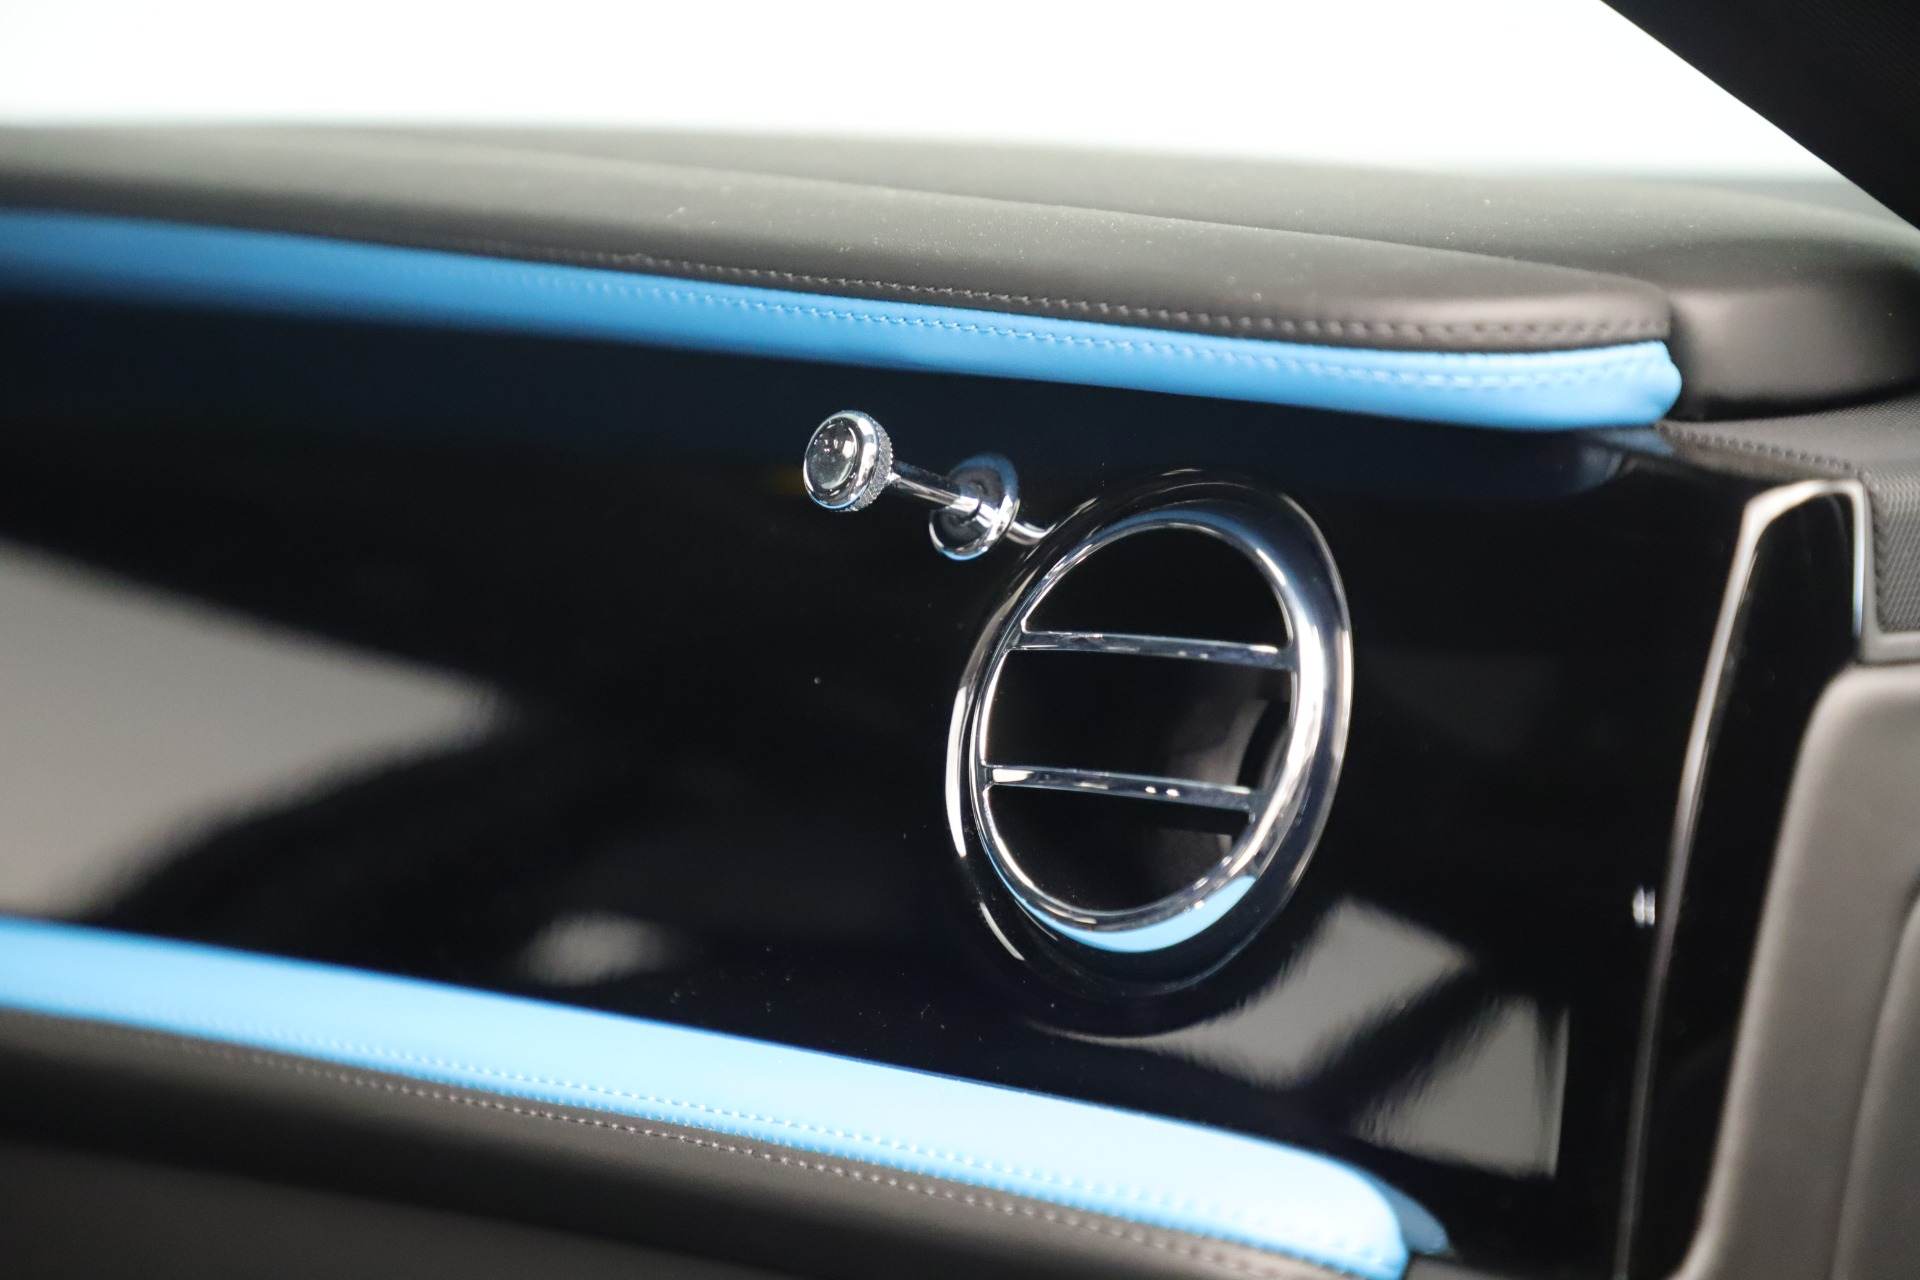 Used 2018 Bentley Mulsanne Speed Design Series For Sale In Westport, CT 3405_p34